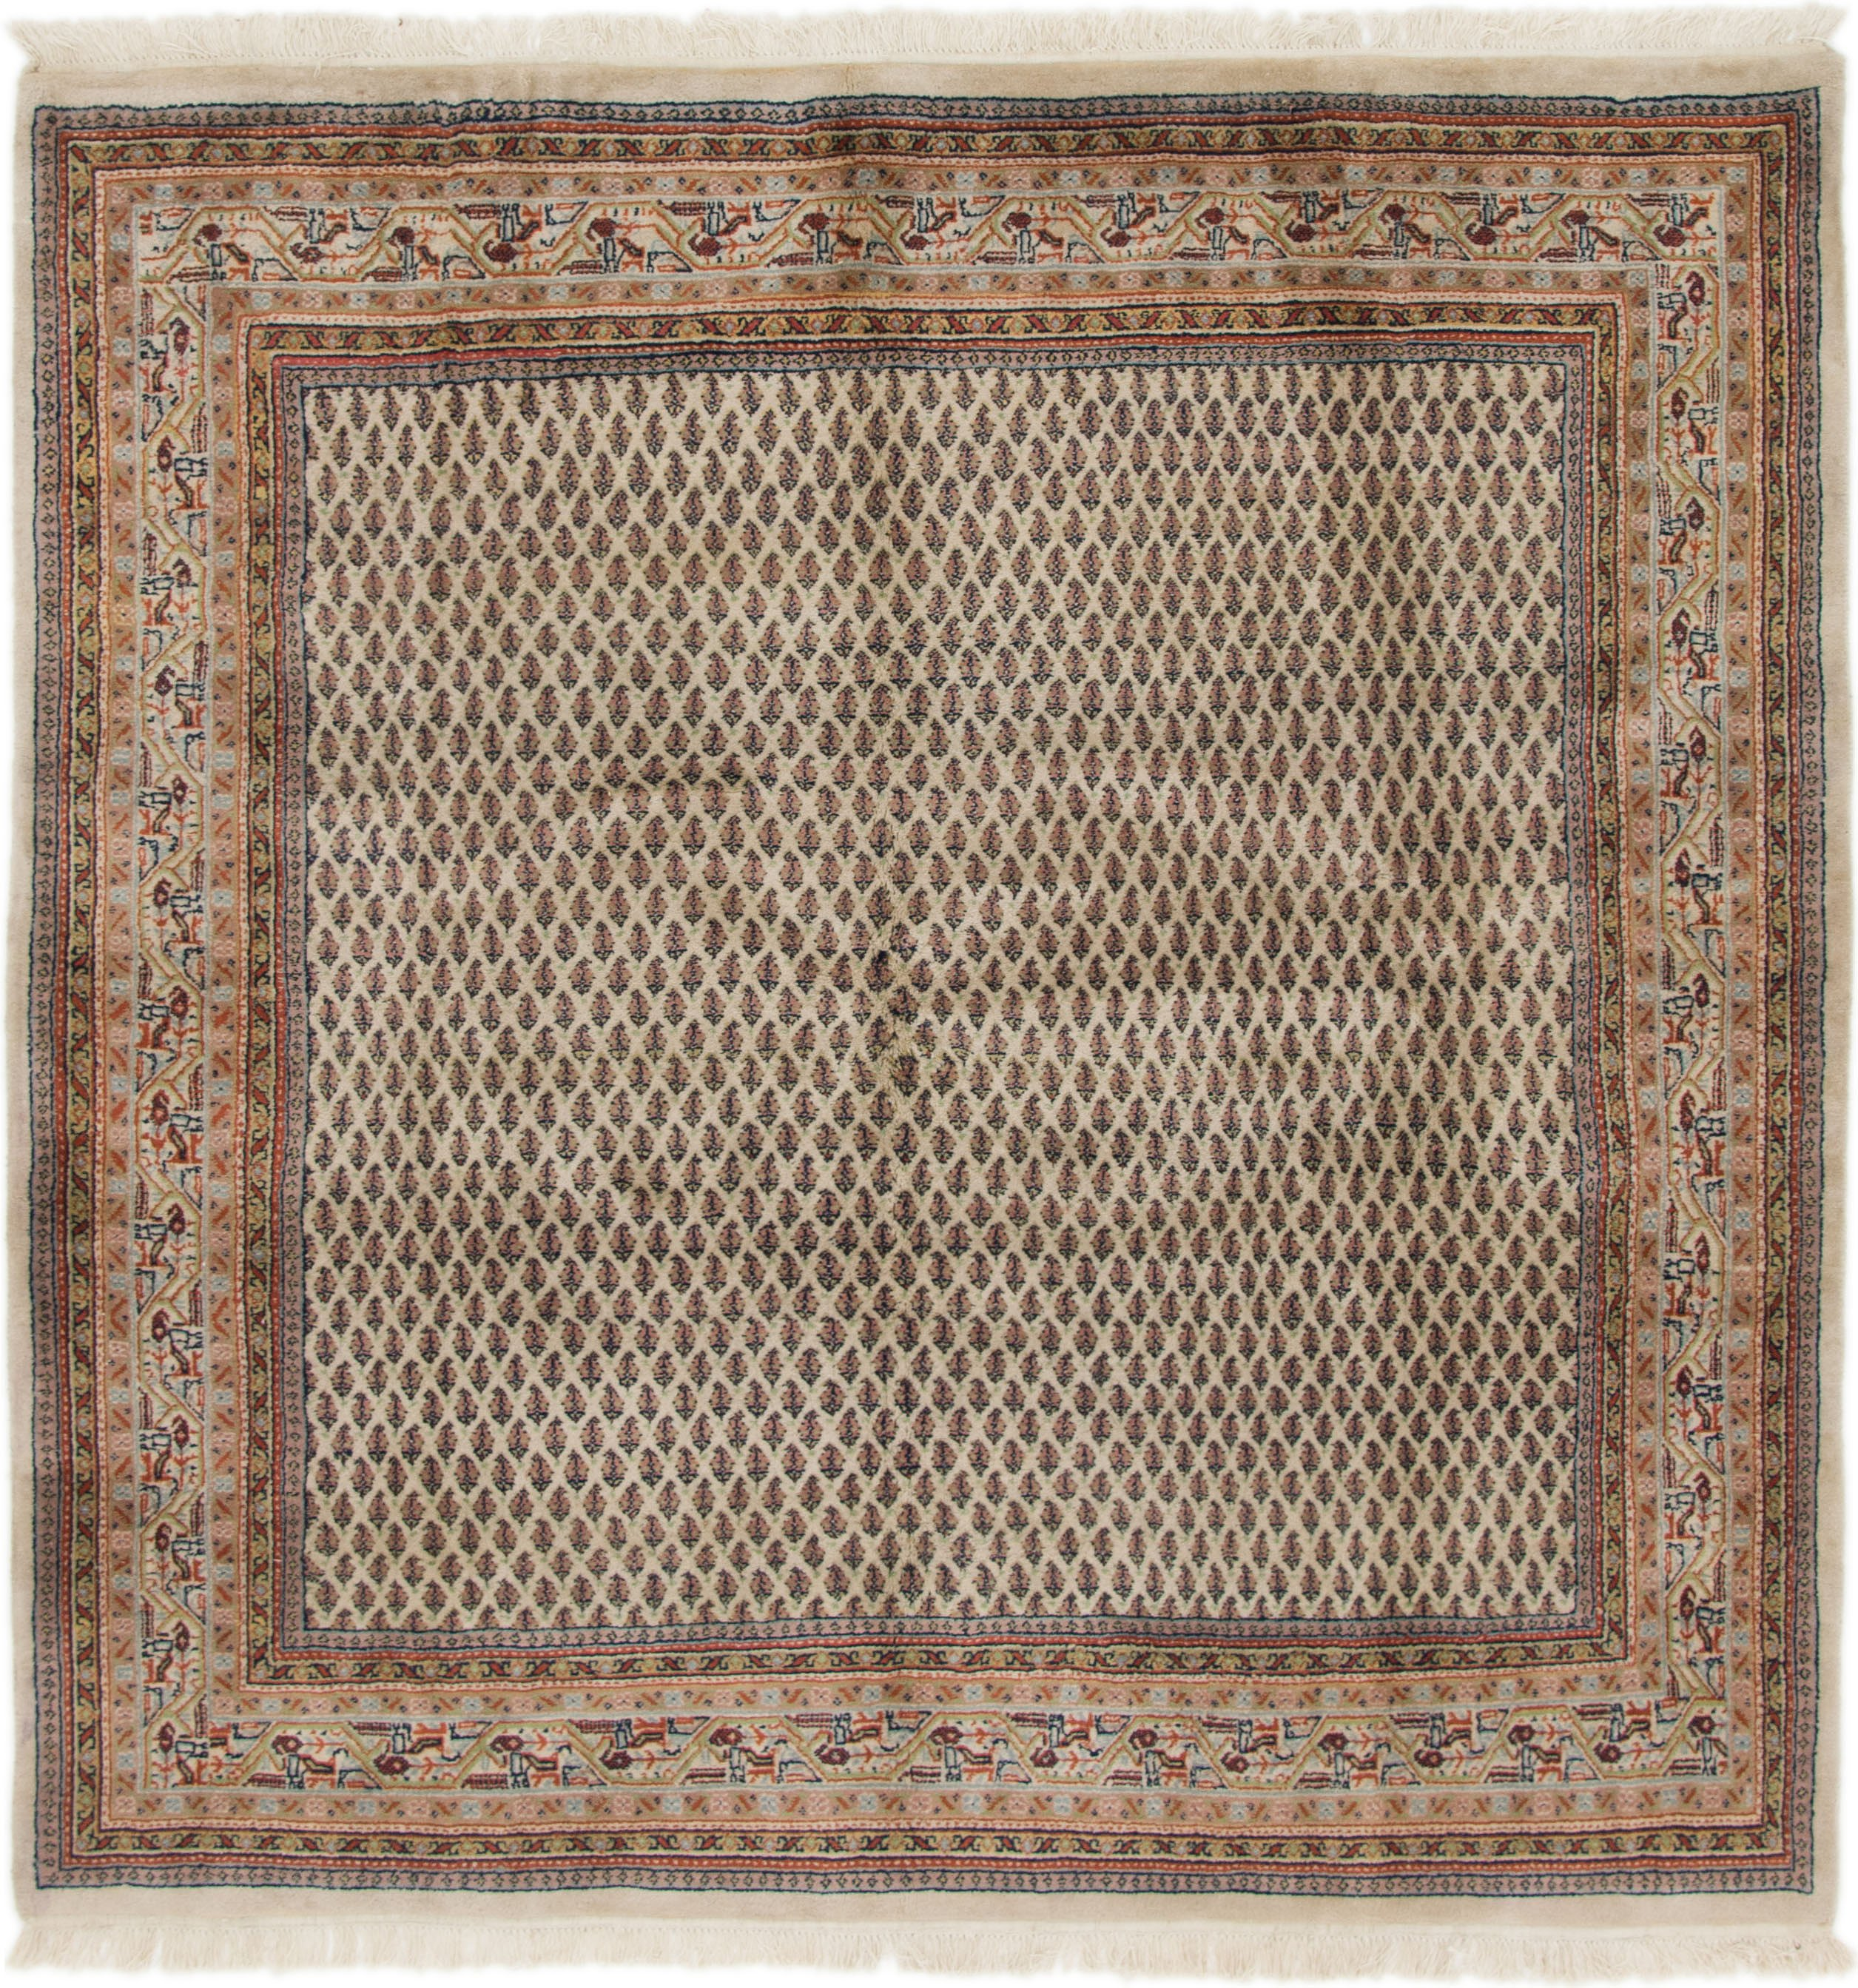 Beige 6 5 X 6 6 Mir Square Rug Oriental Rugs Unique Loom